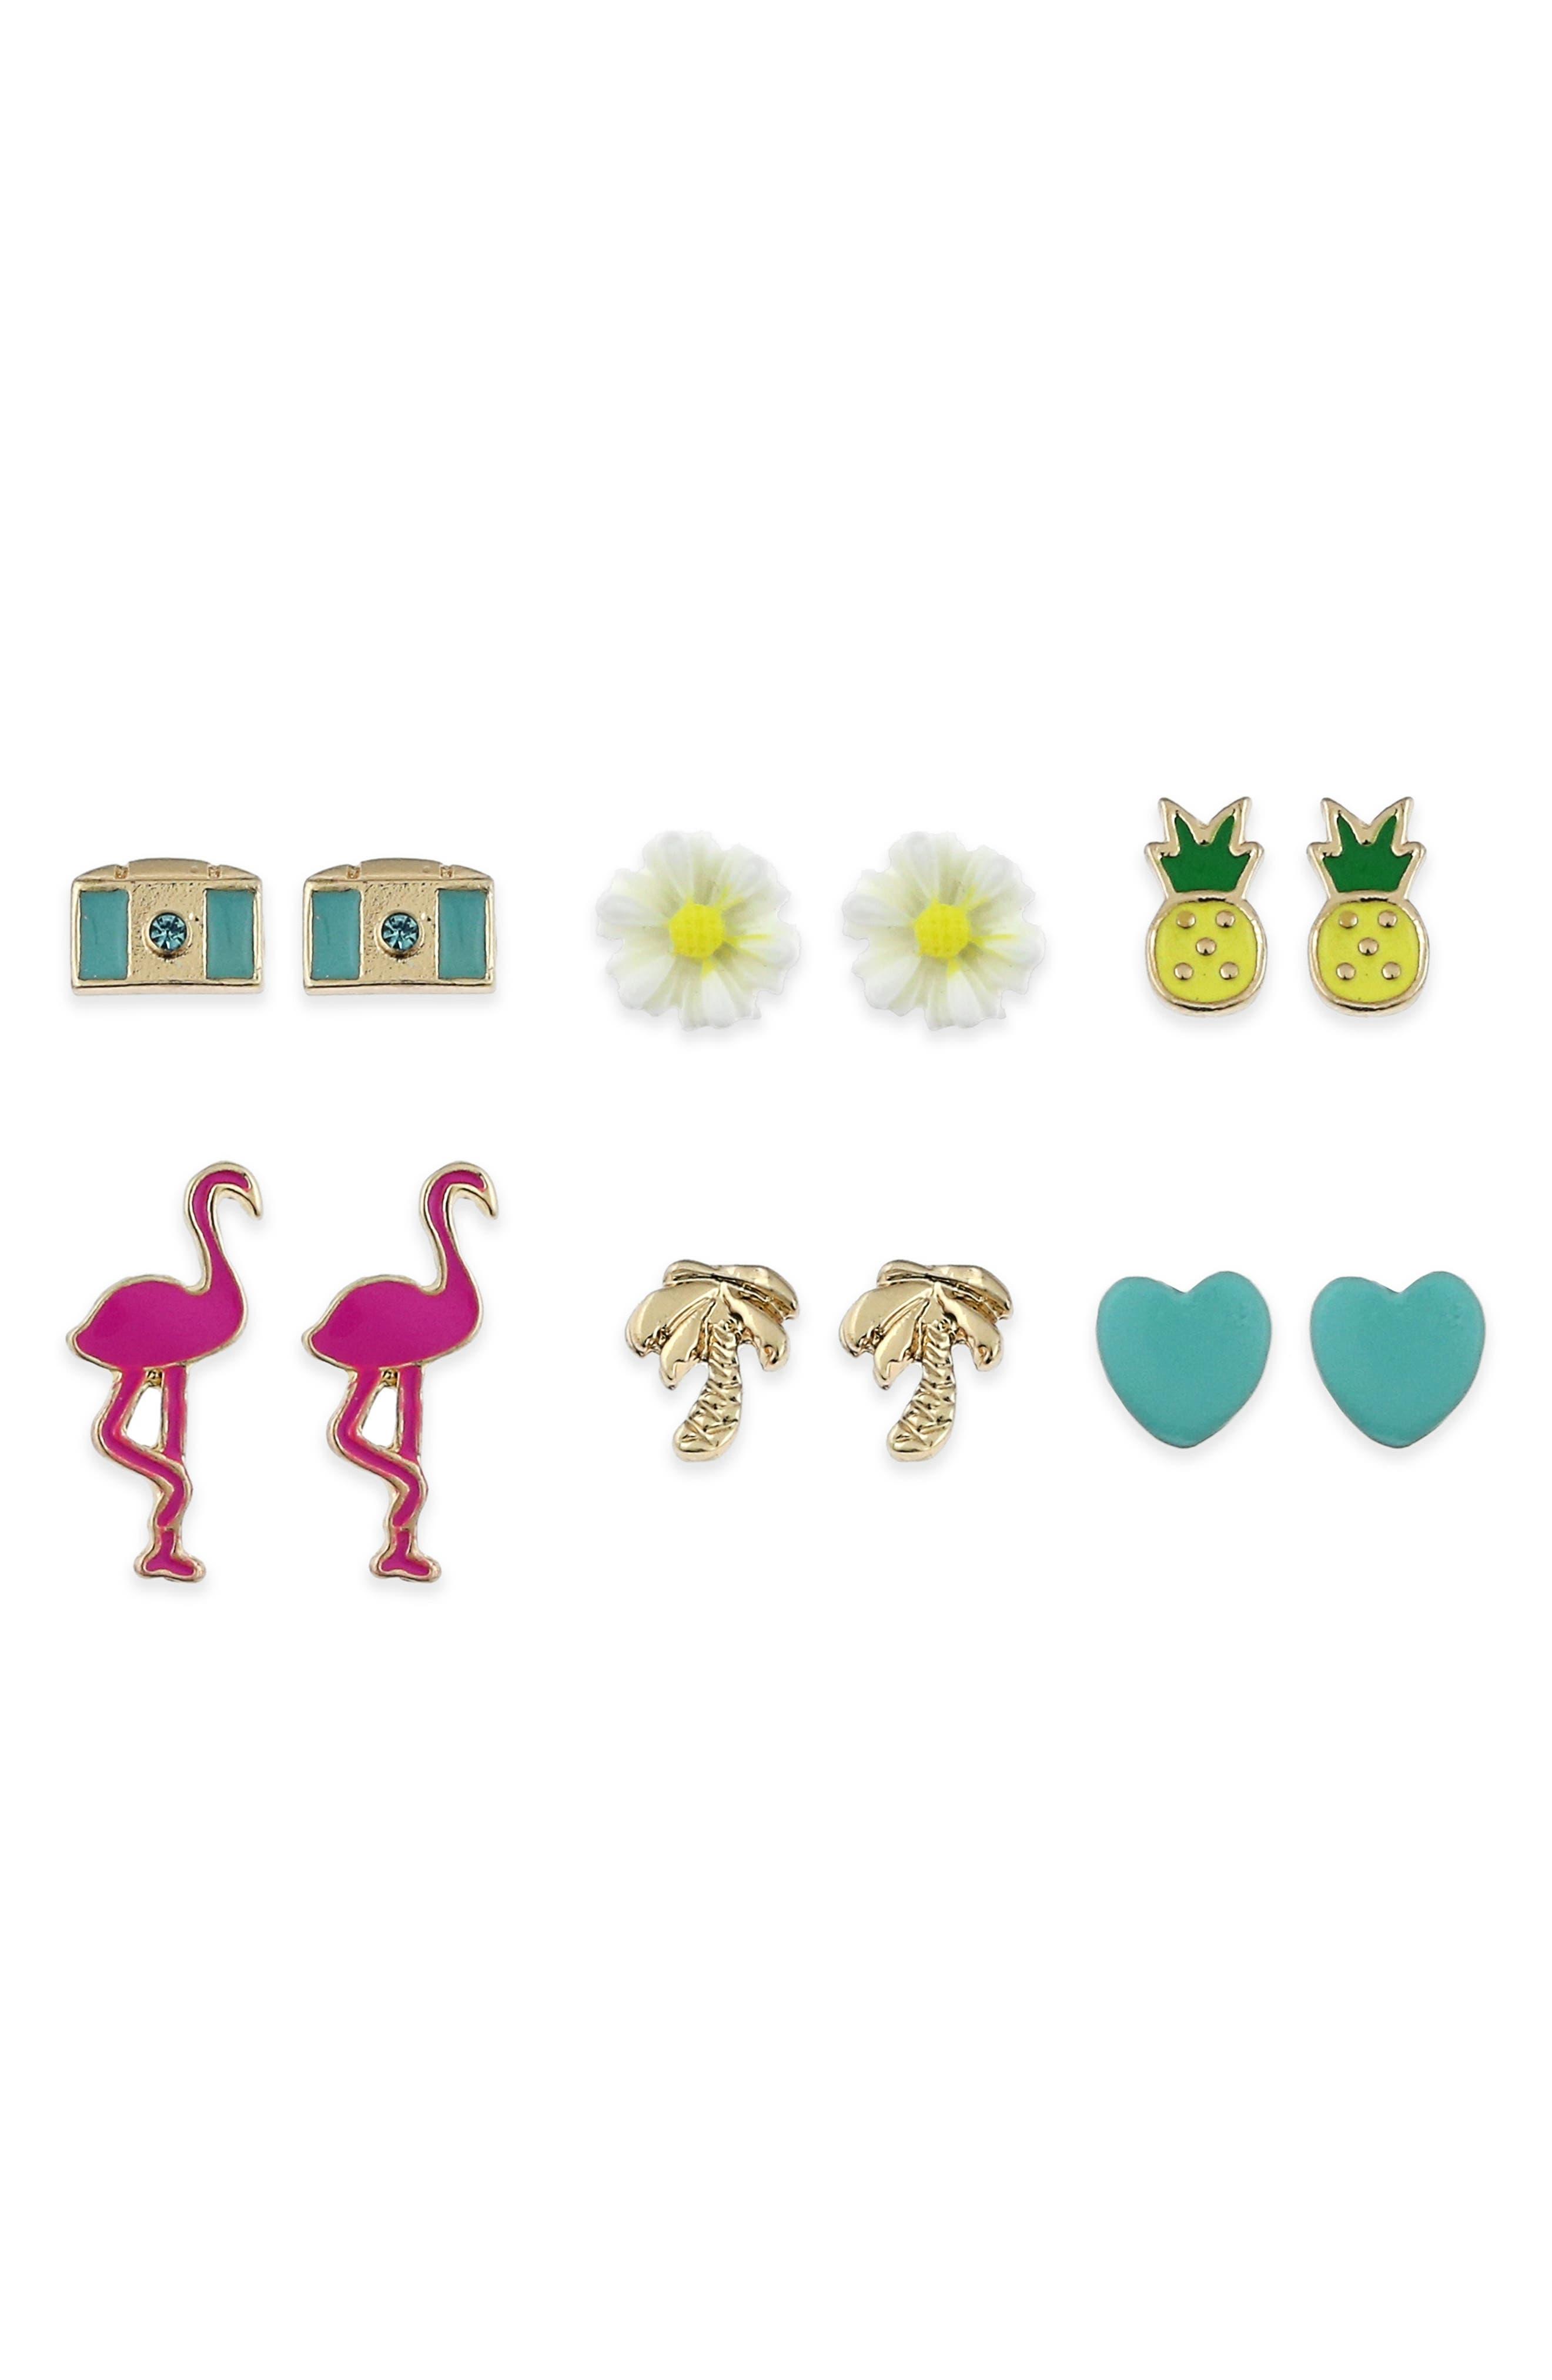 Tropical 6-Pack Earrings,                             Main thumbnail 1, color,                             705